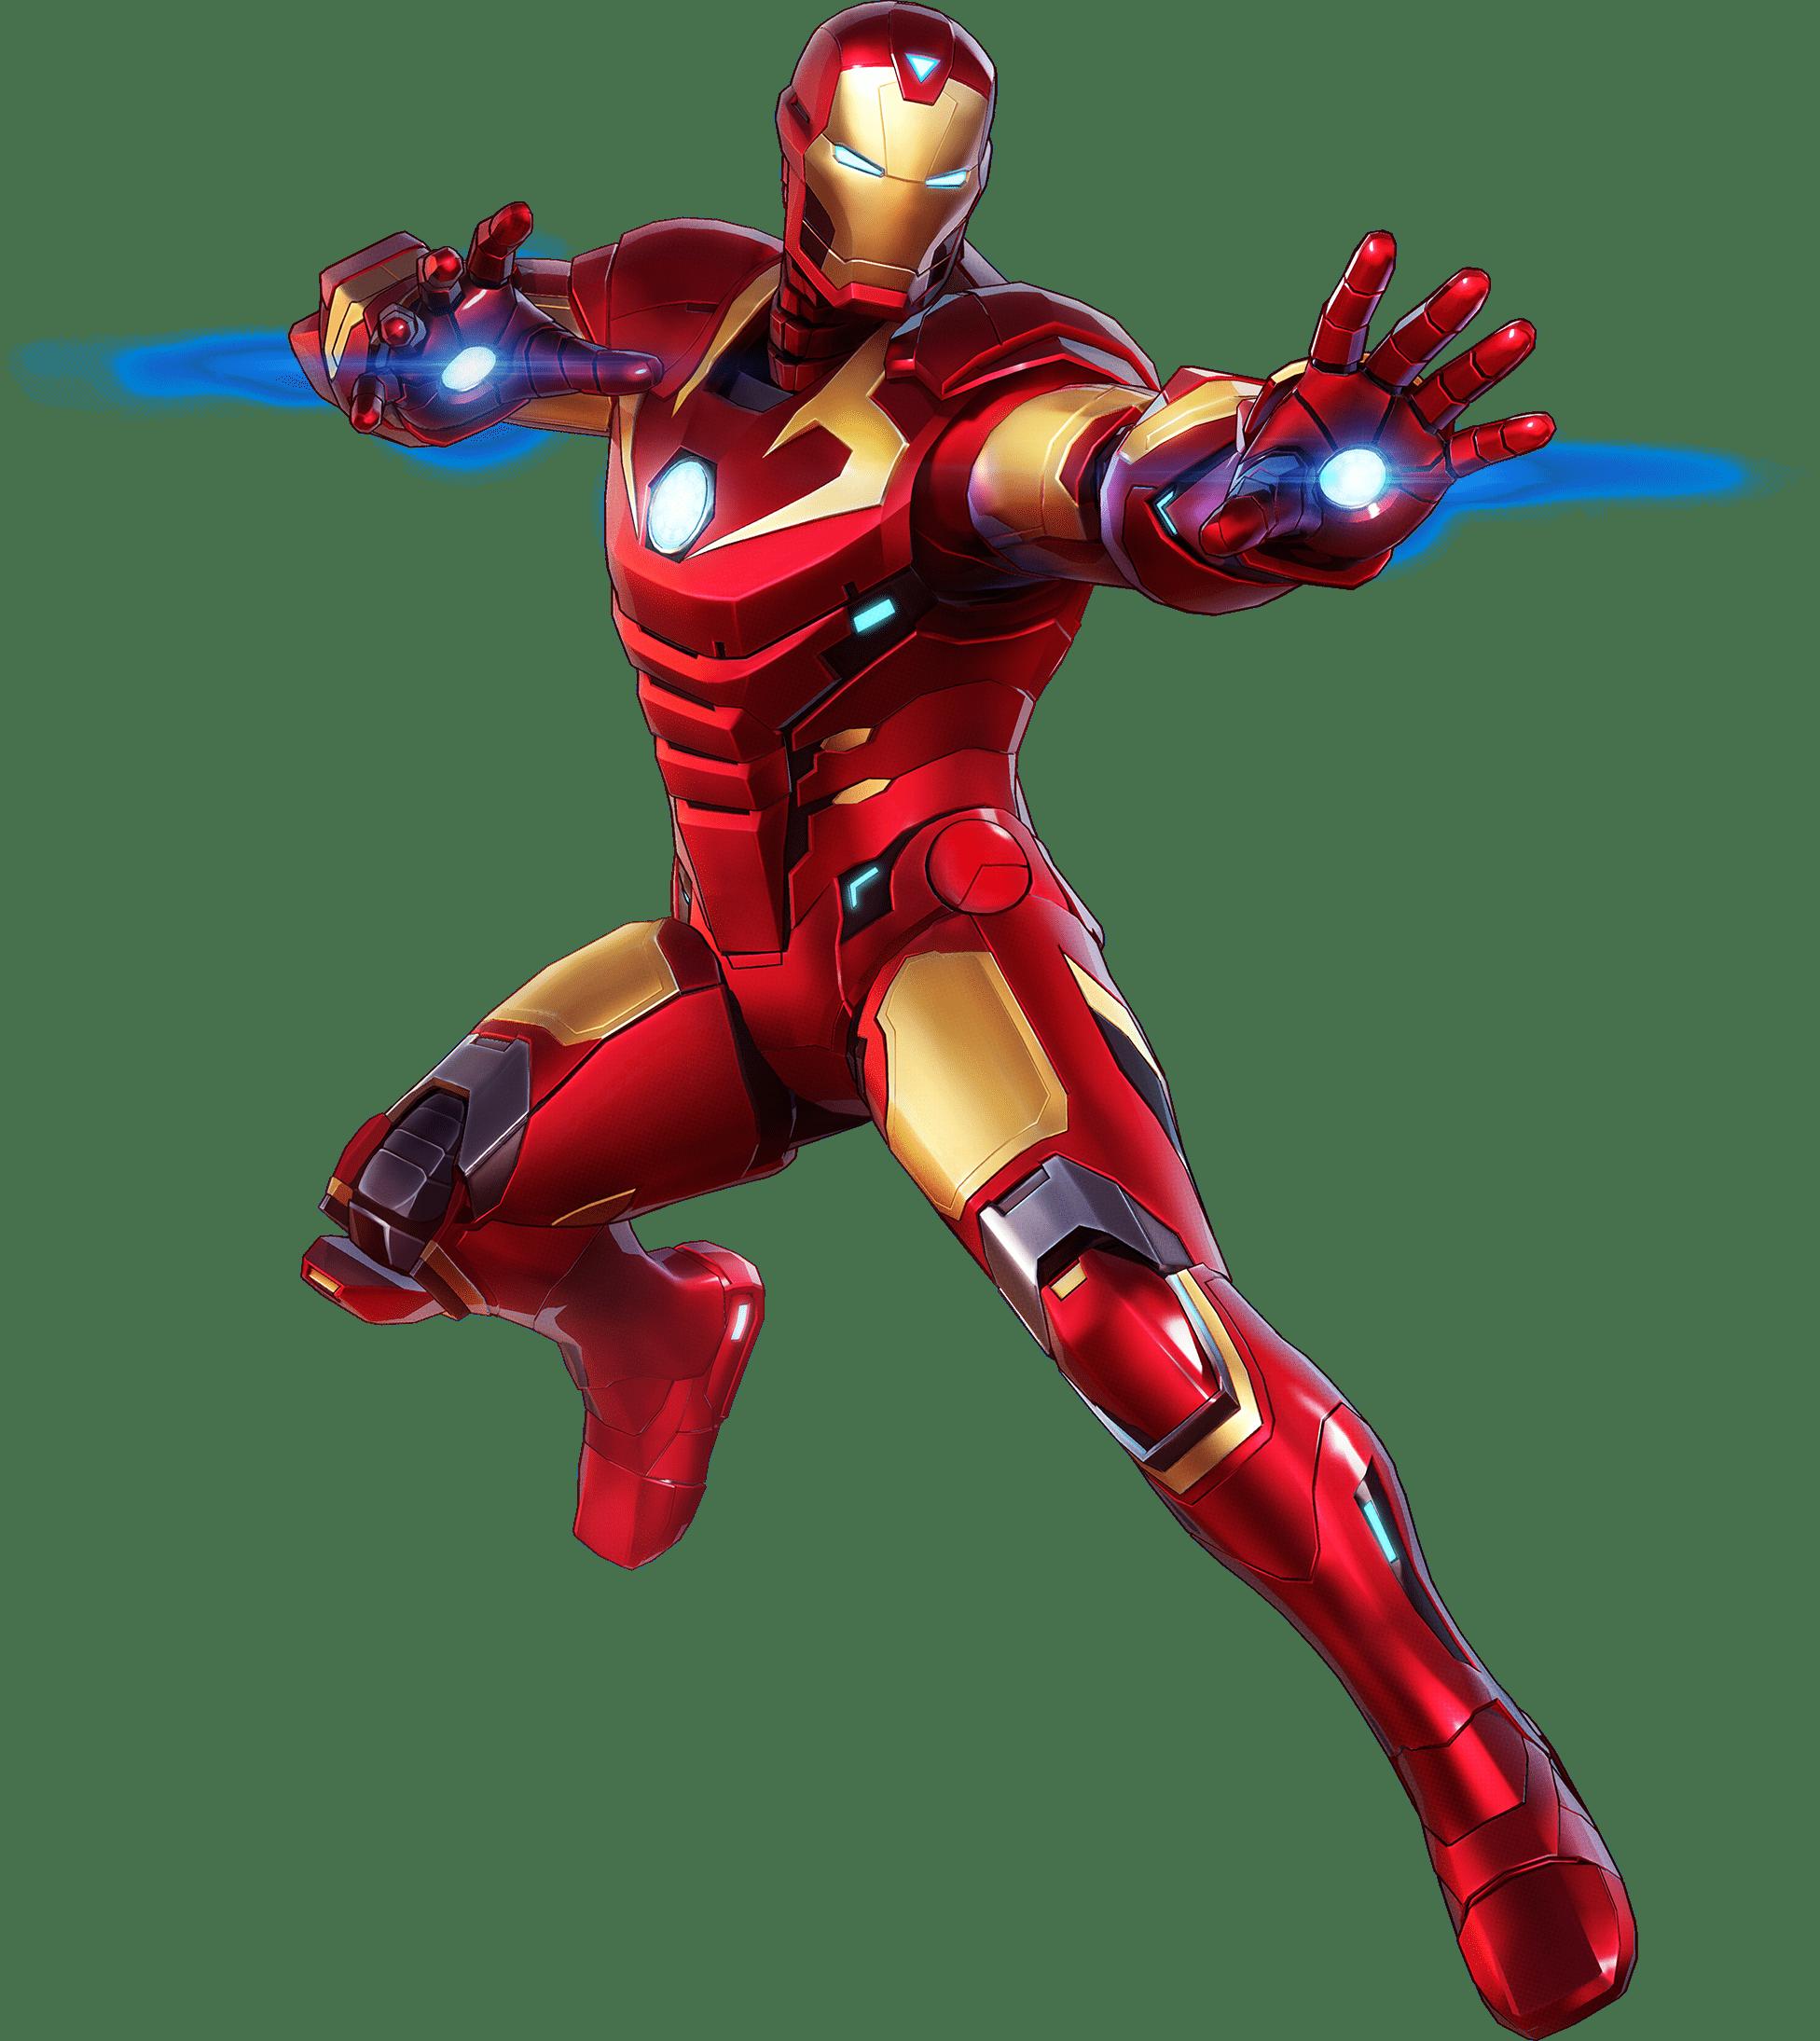 Iron Man | Marvel: Ultimate Alliance Wiki | FANDOM powered